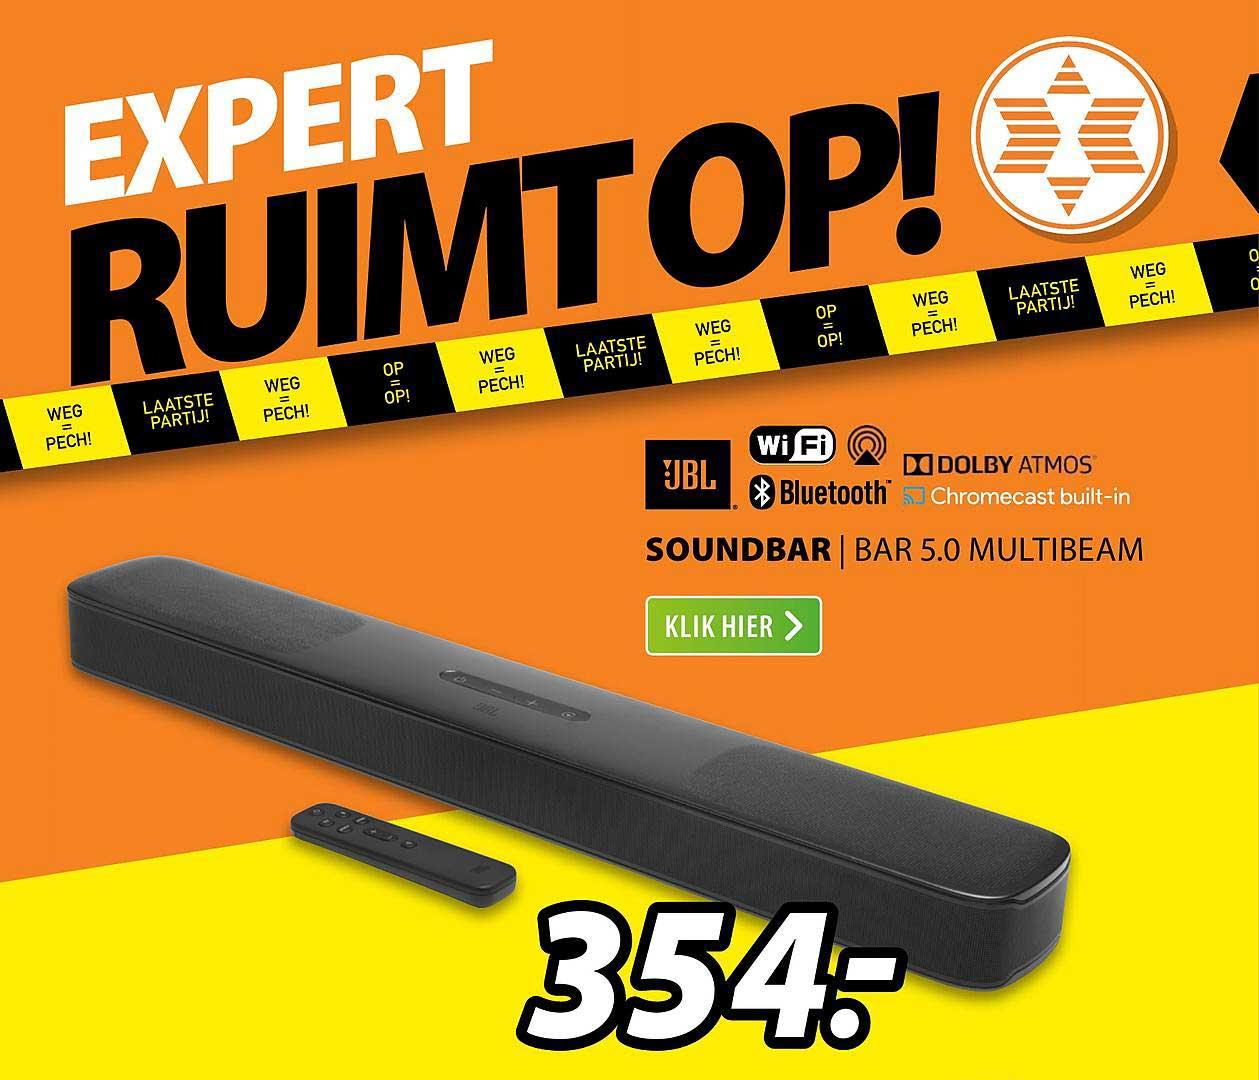 Expert JBL Soundbar | Bar 5.0 Multibeam